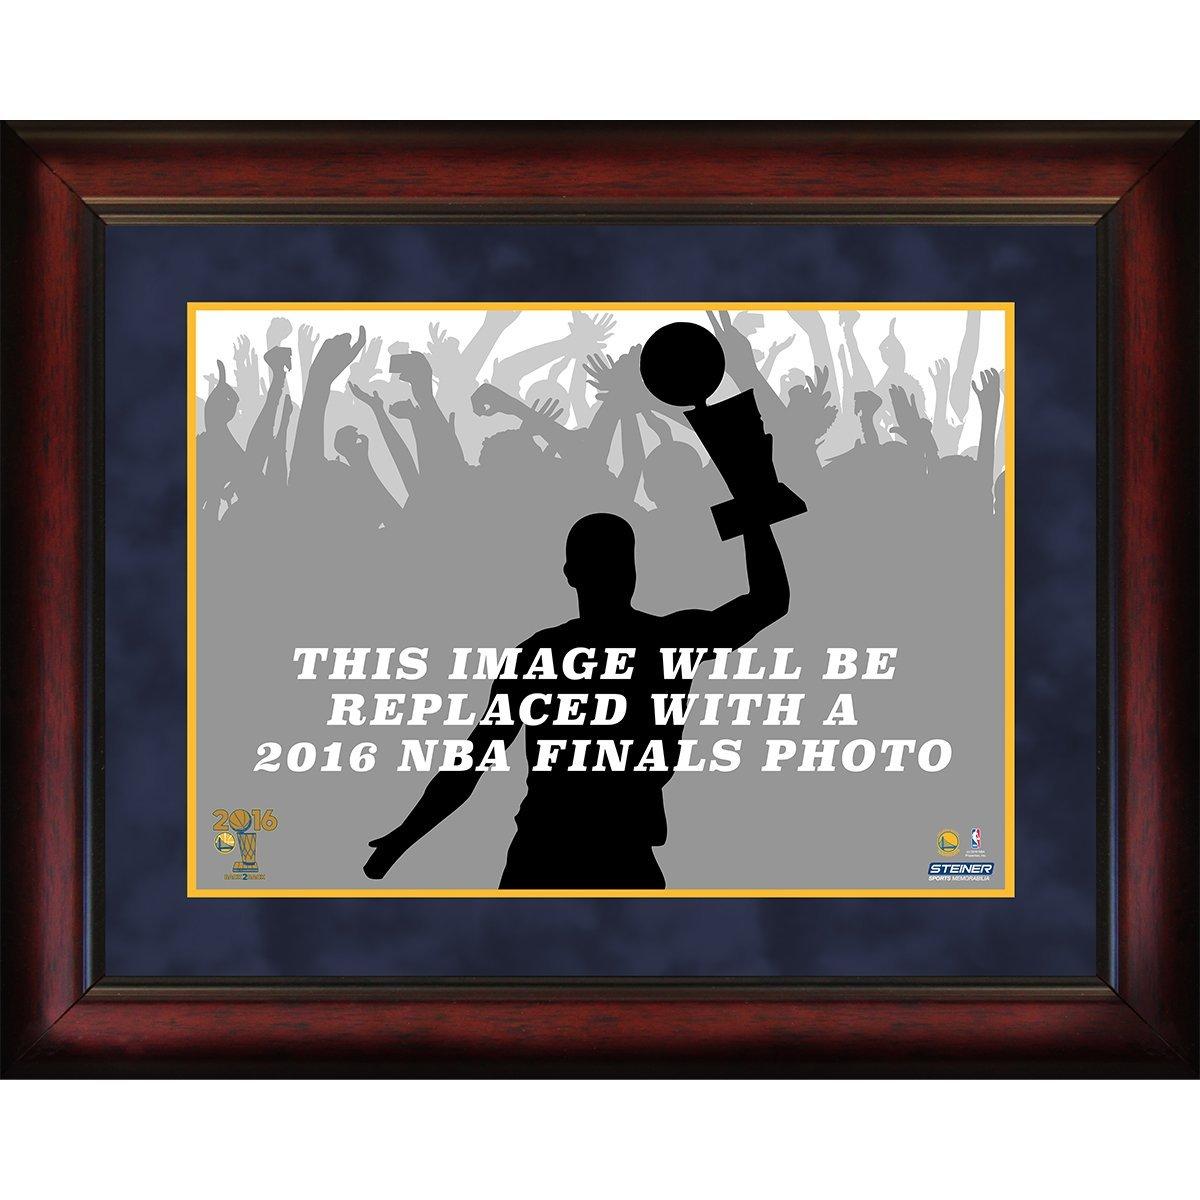 NBA Golden State Warriors Unisex 2016 NBA Champion Golden State Warriors 16x20 Framed Photo, Navy